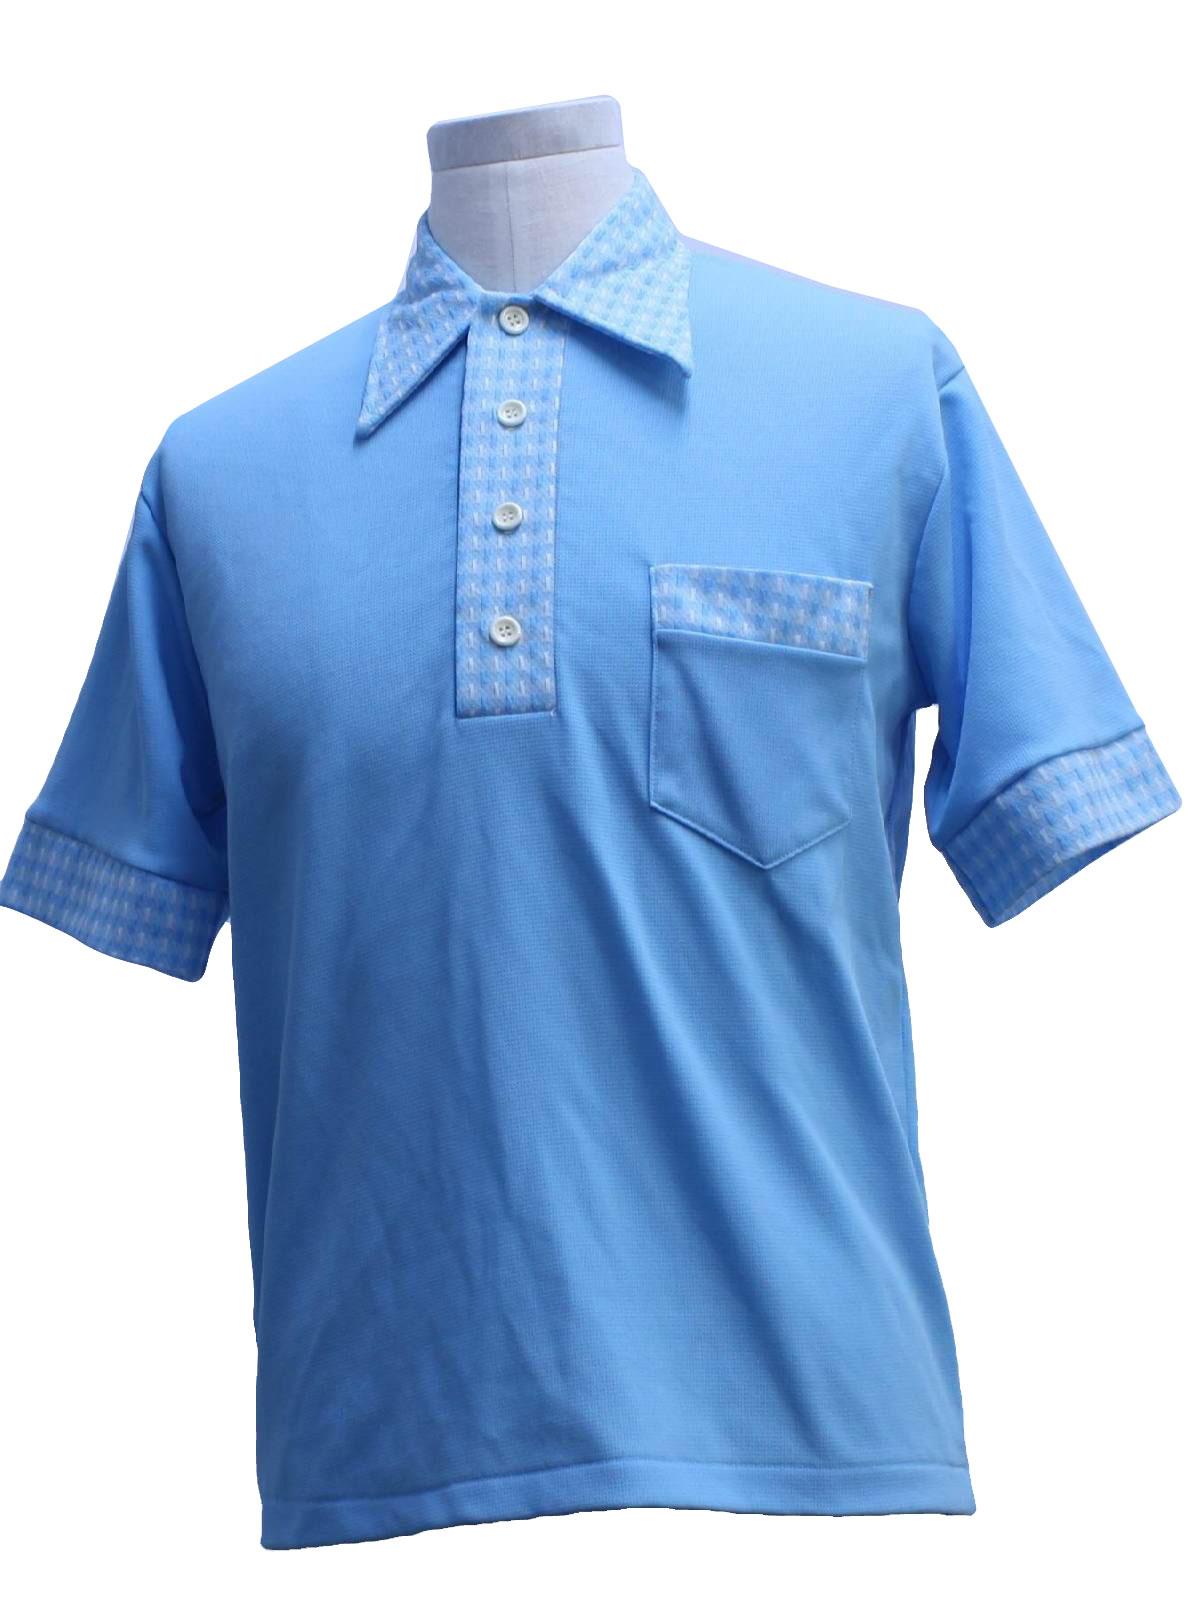 1970 39 S Vintage Jockey Knit Shirt 70s Jockey Mens Sky